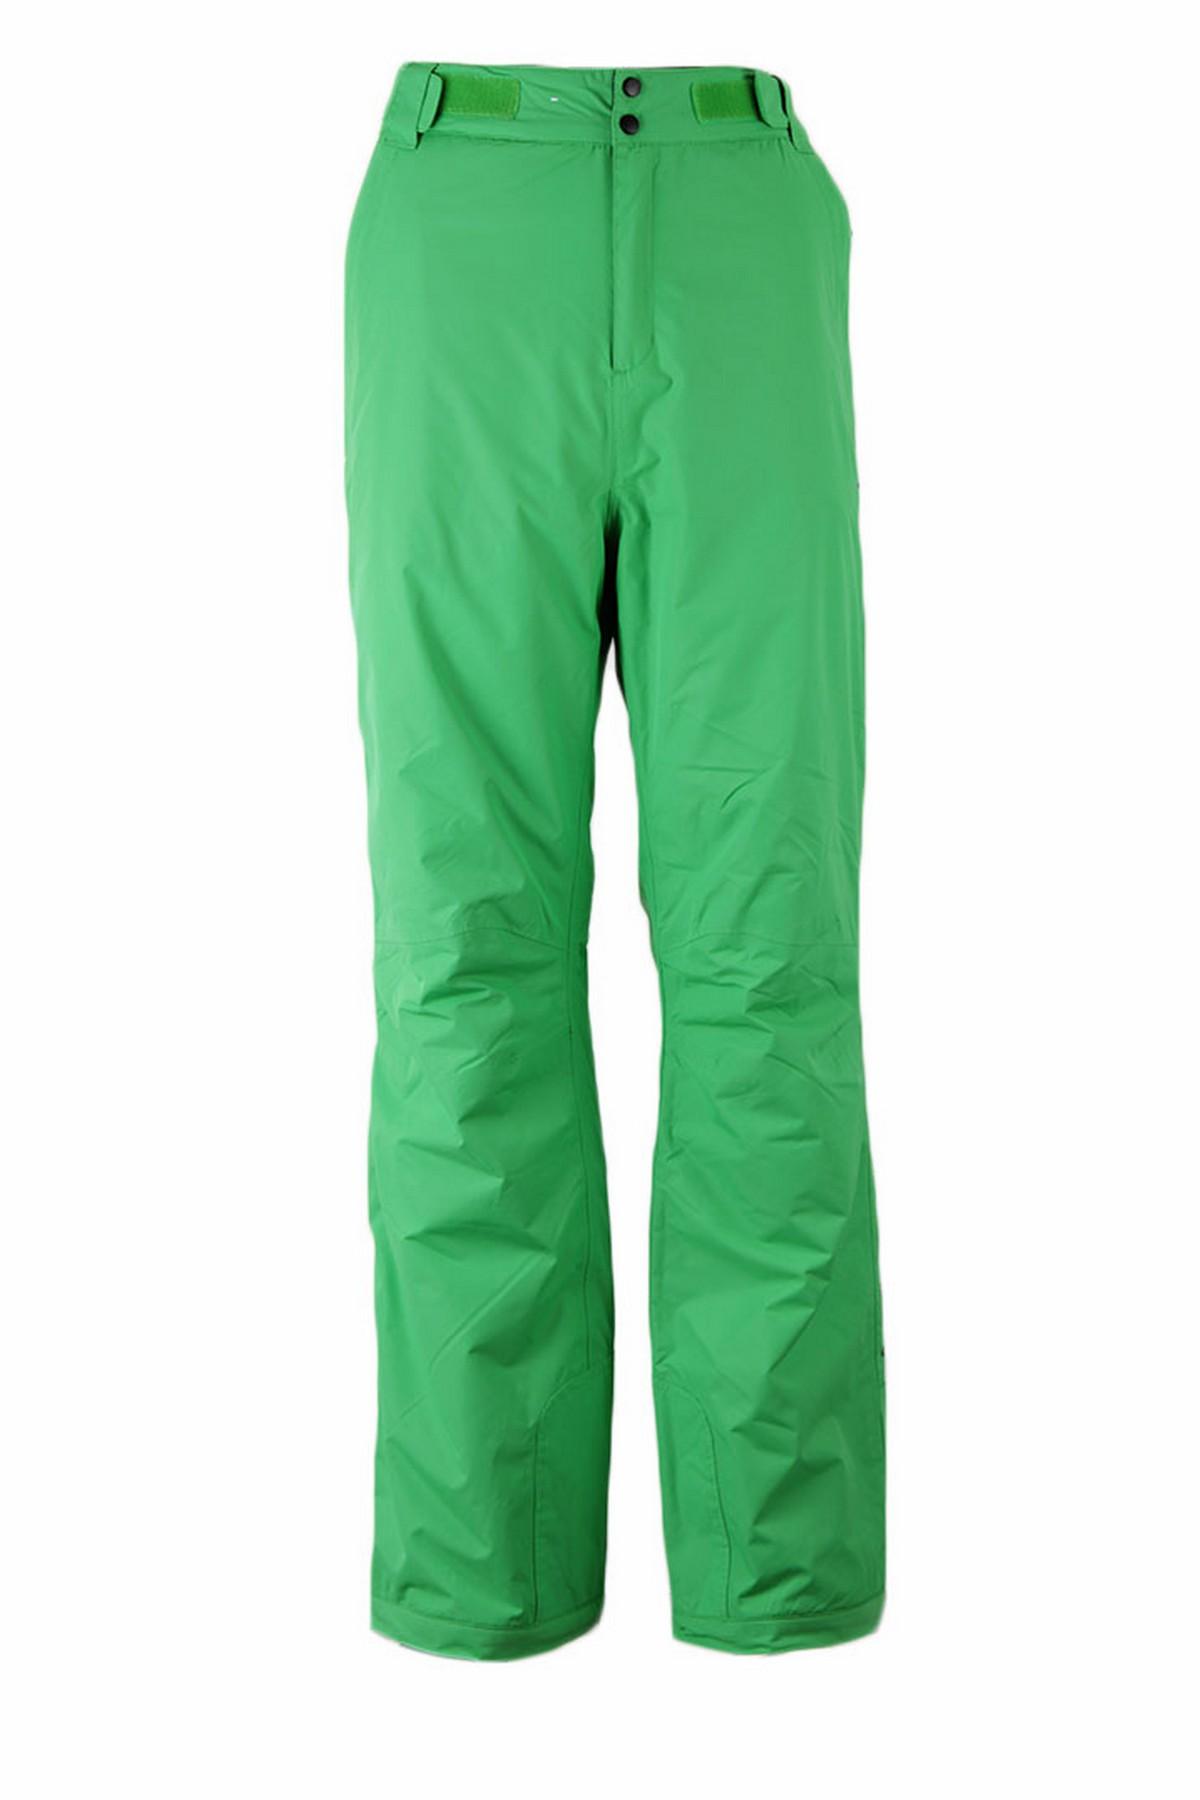 Dare2b Divedown Kadın Pantolon Yeşil (DMW050-07H)